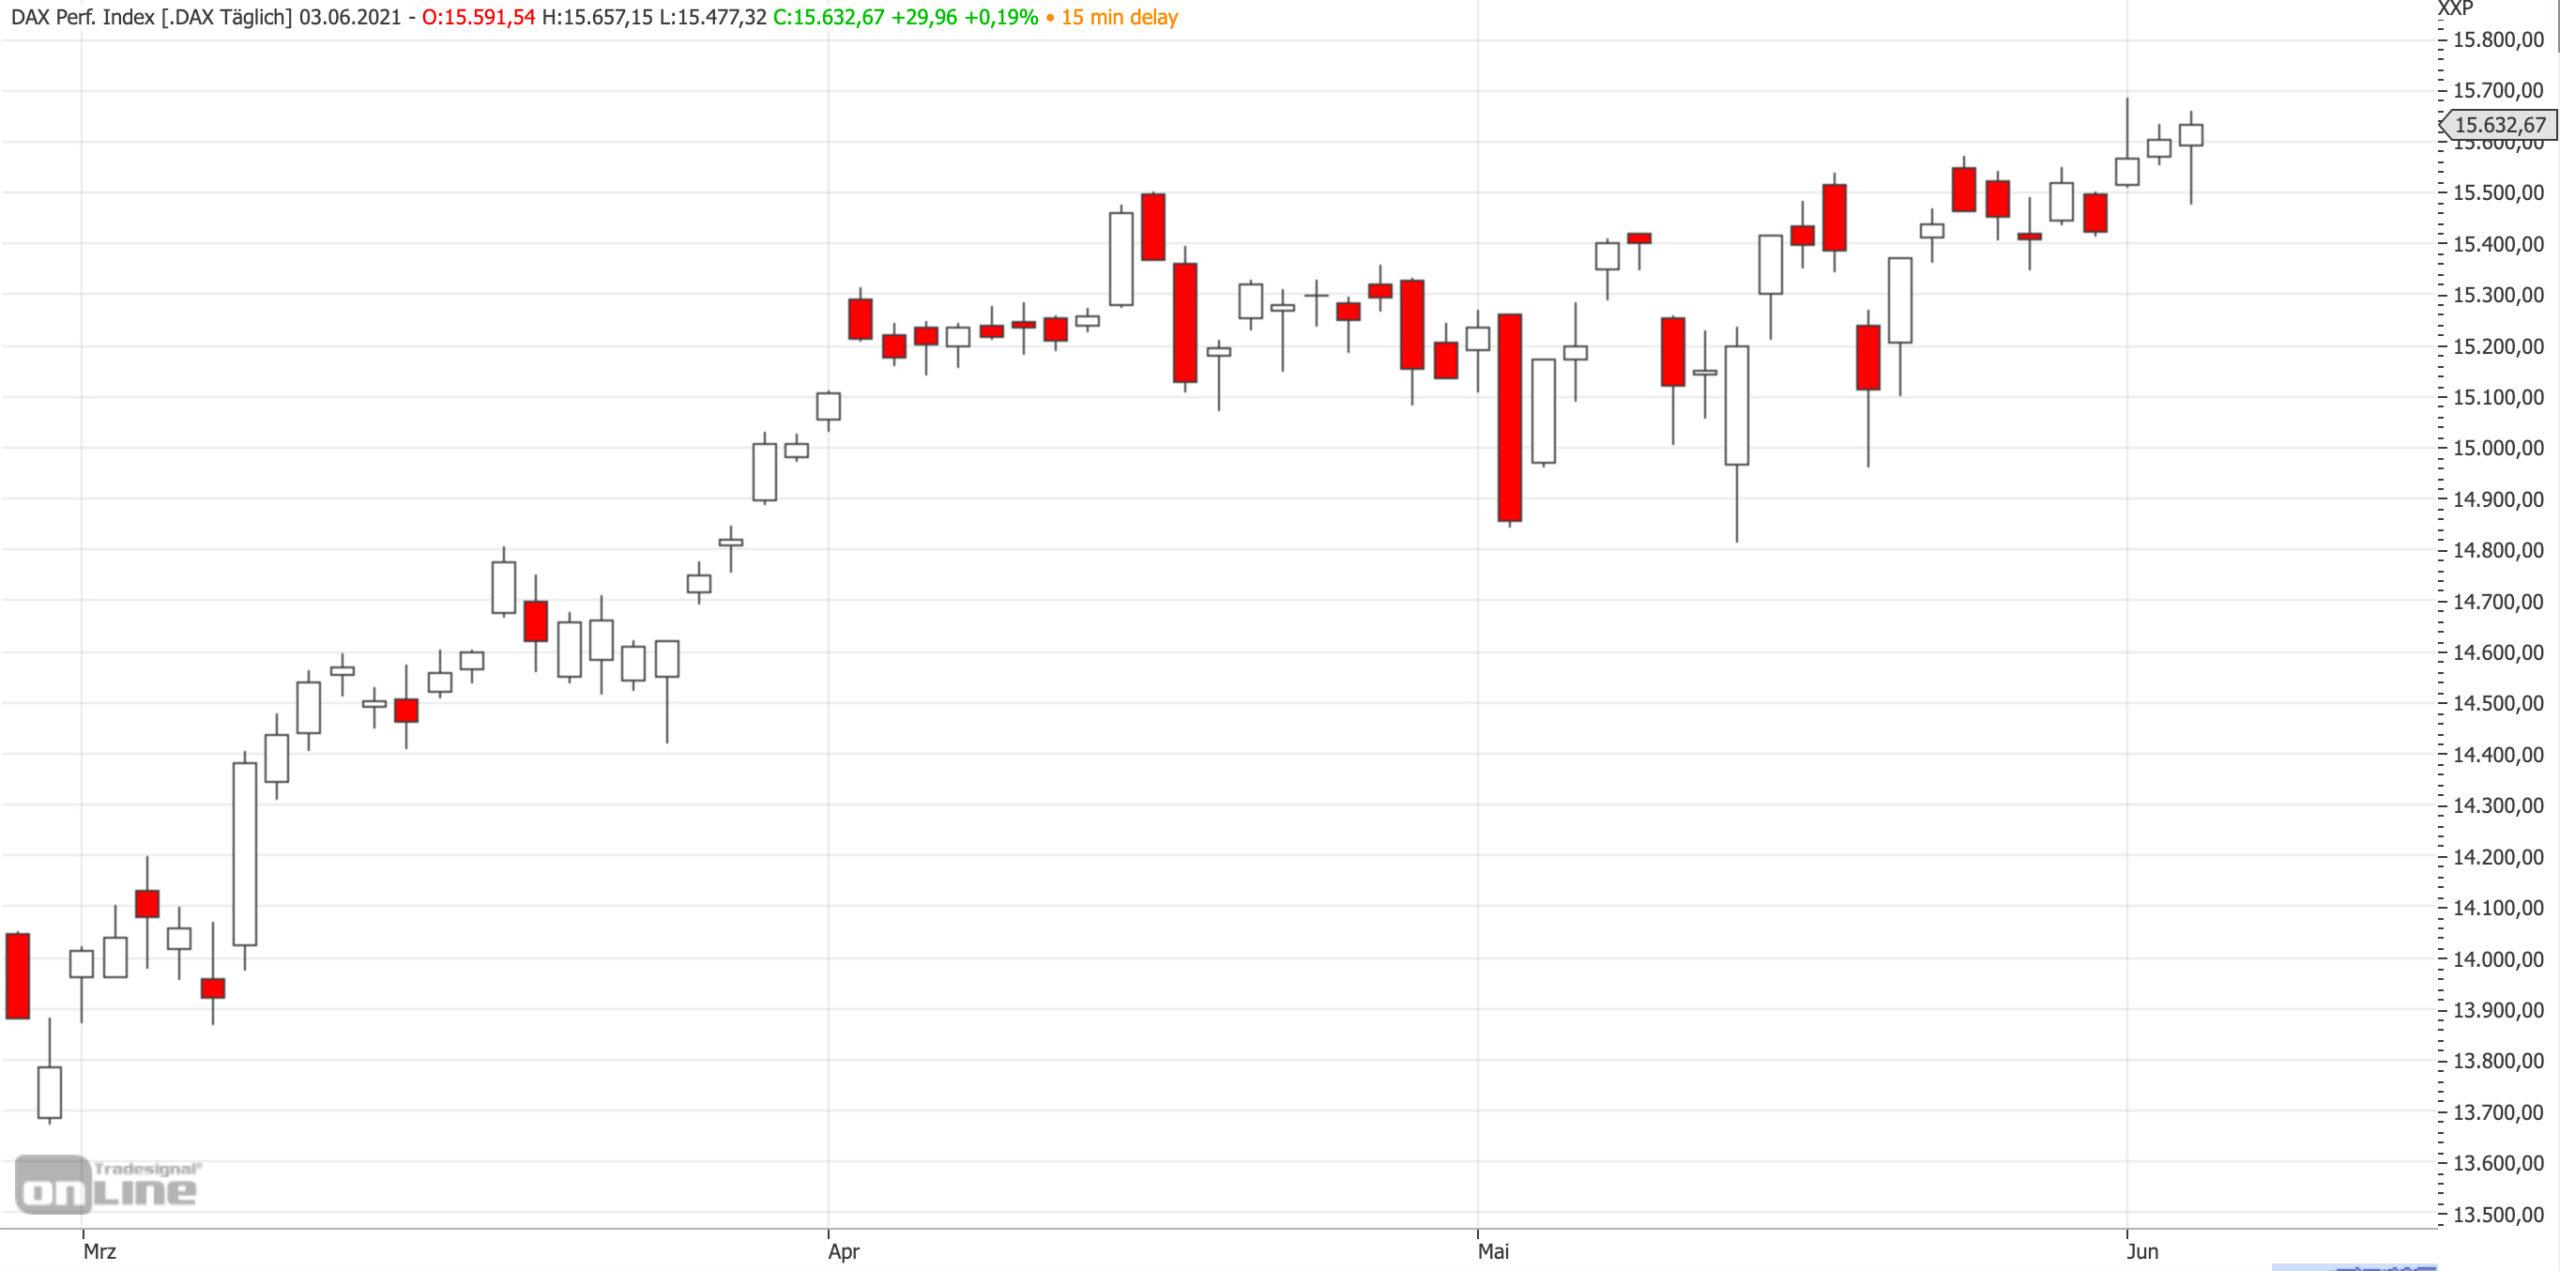 Mittelfristiger DAX-Chart am 03.06.2021